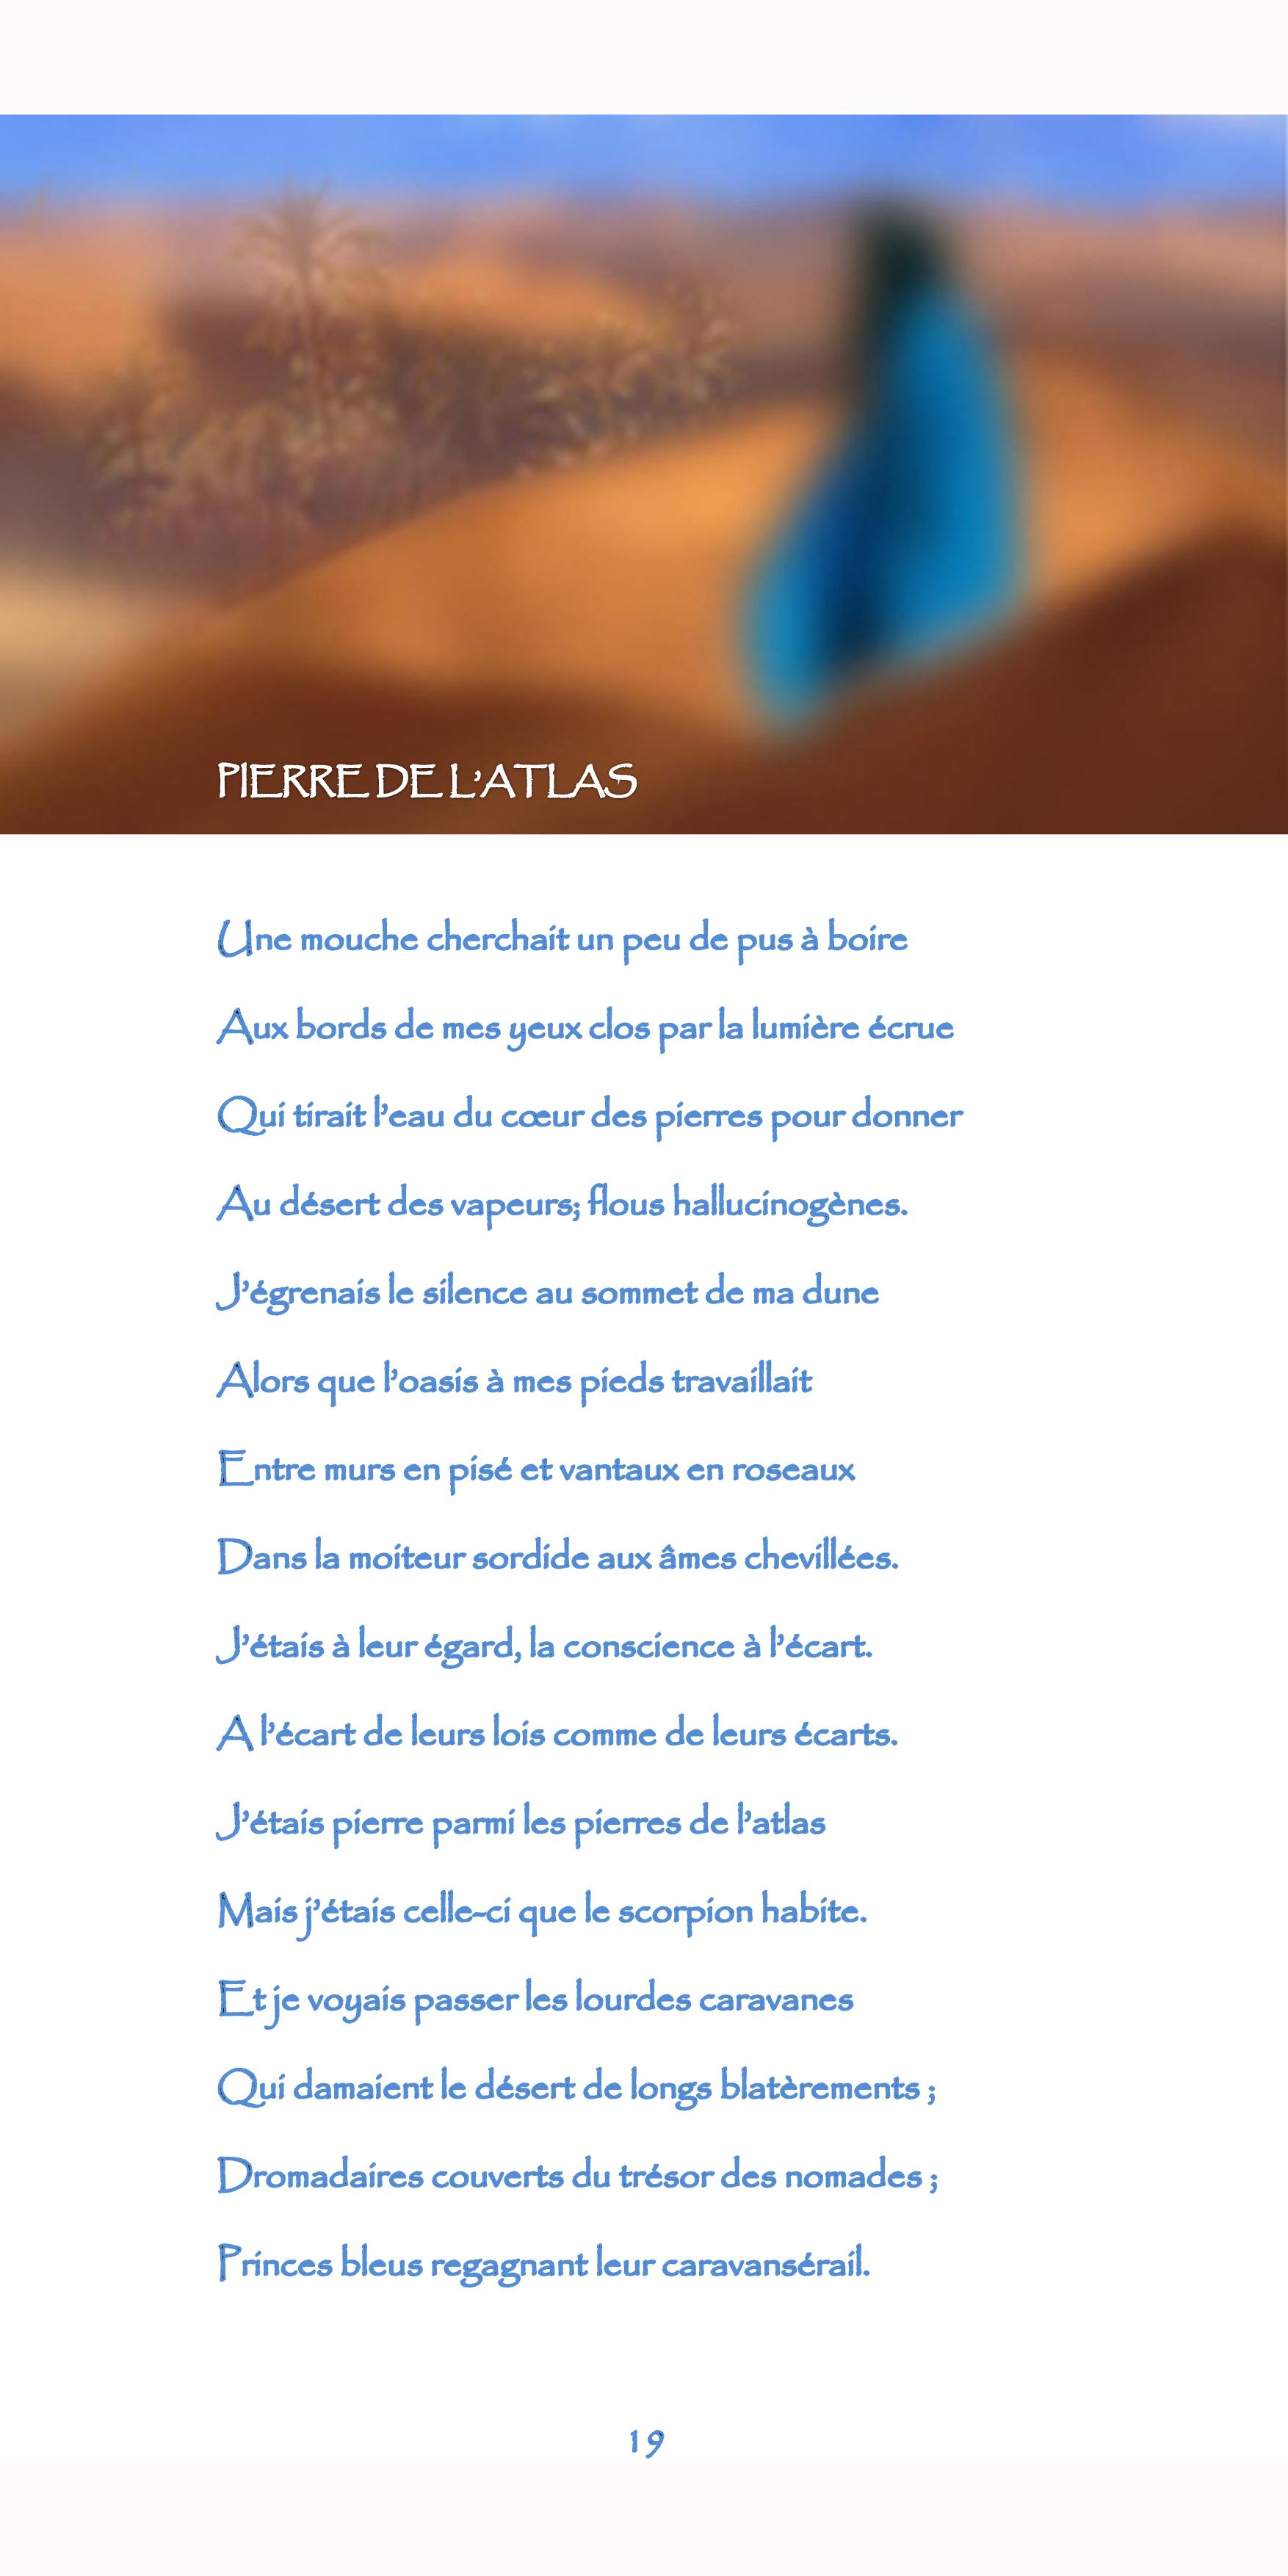 19-nègre bleu-pierre de l'Atlas.jpg